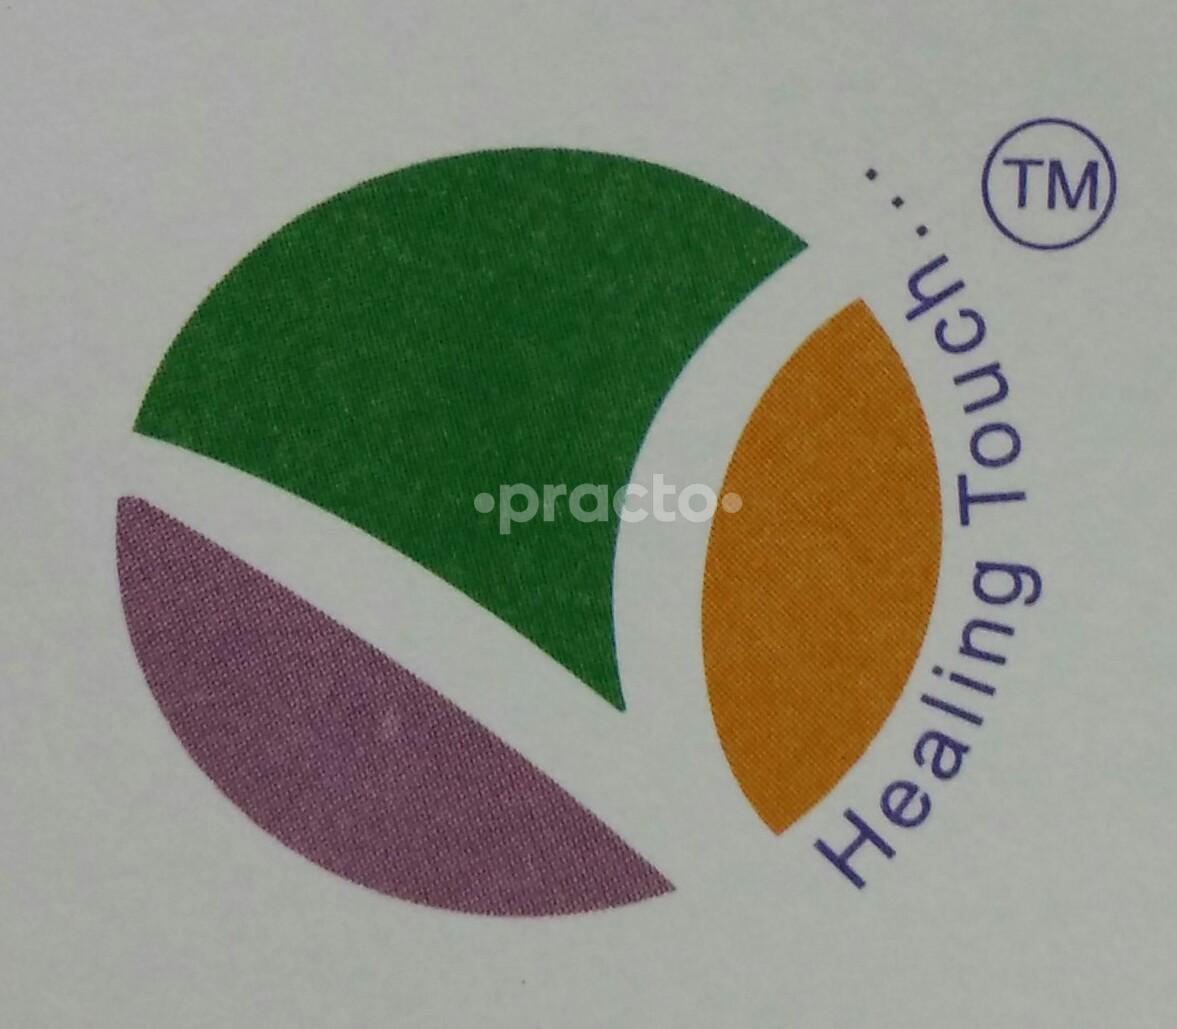 Vardhman Multispeciality Clinic Pvt Ltd